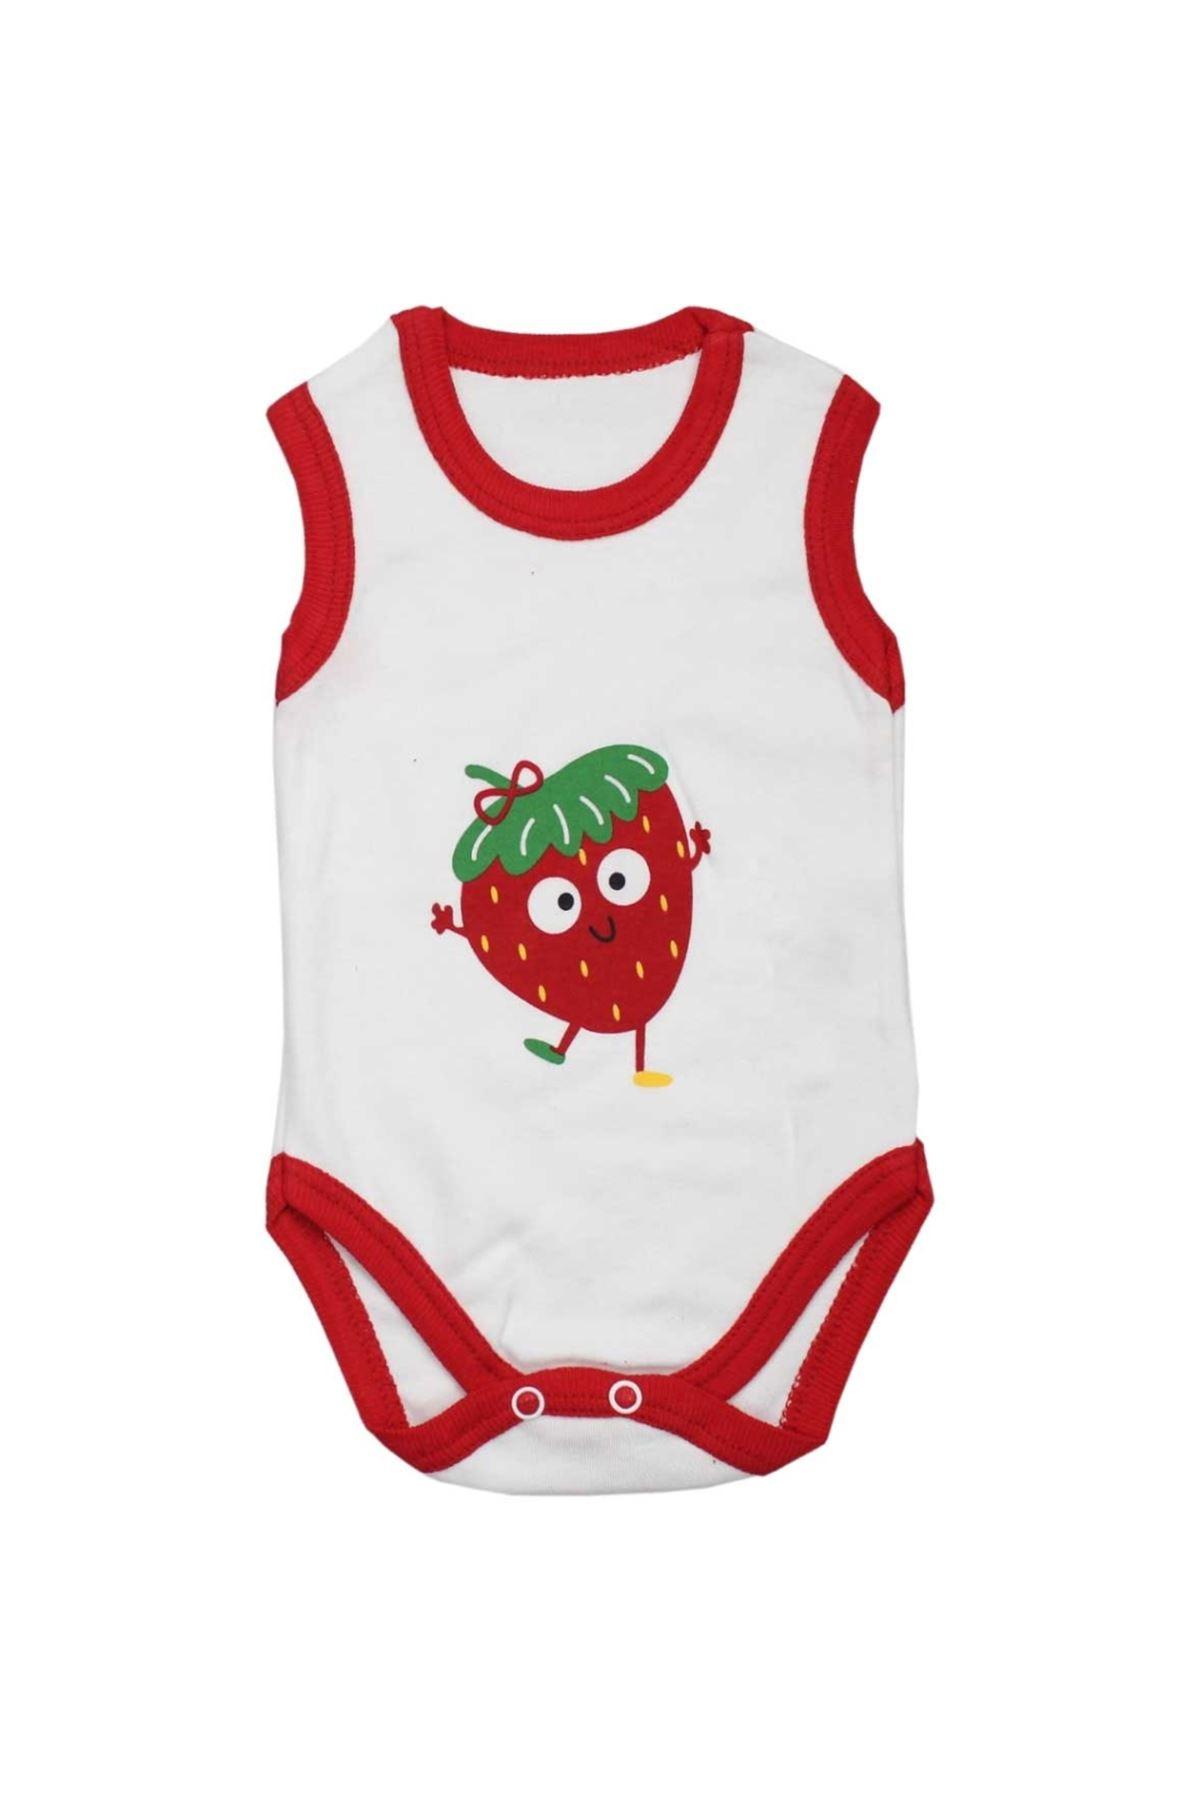 Modakids Baby Girl Strawberry Printed Snaps Bady 071-045-002